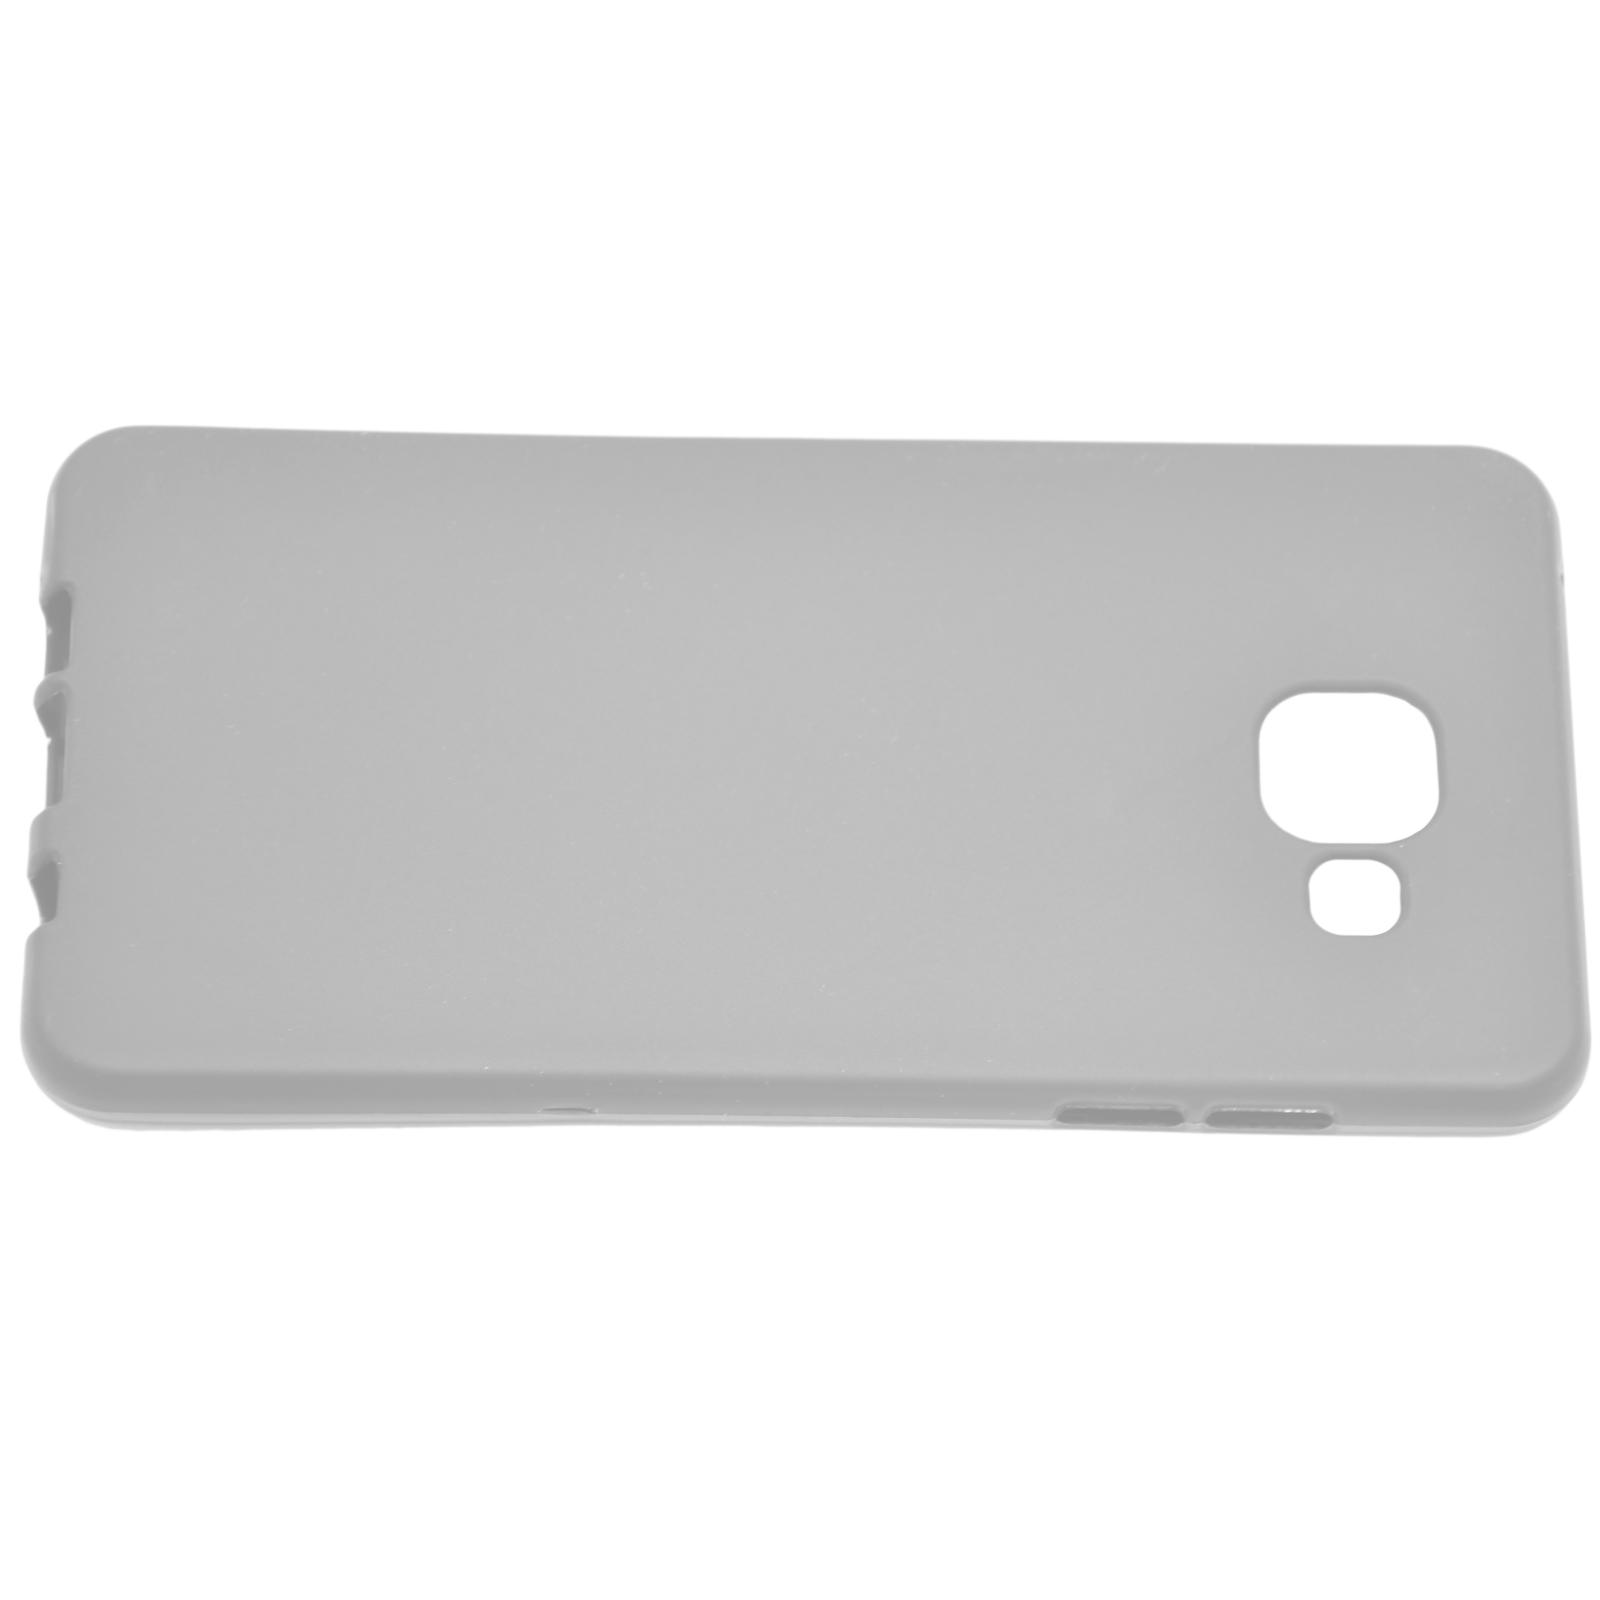 Чехол для моб. телефона Pro-case для Samsung Galaxy A5 (A510) White (CP-306-WHT) (CP-306-WHT) изображение 3